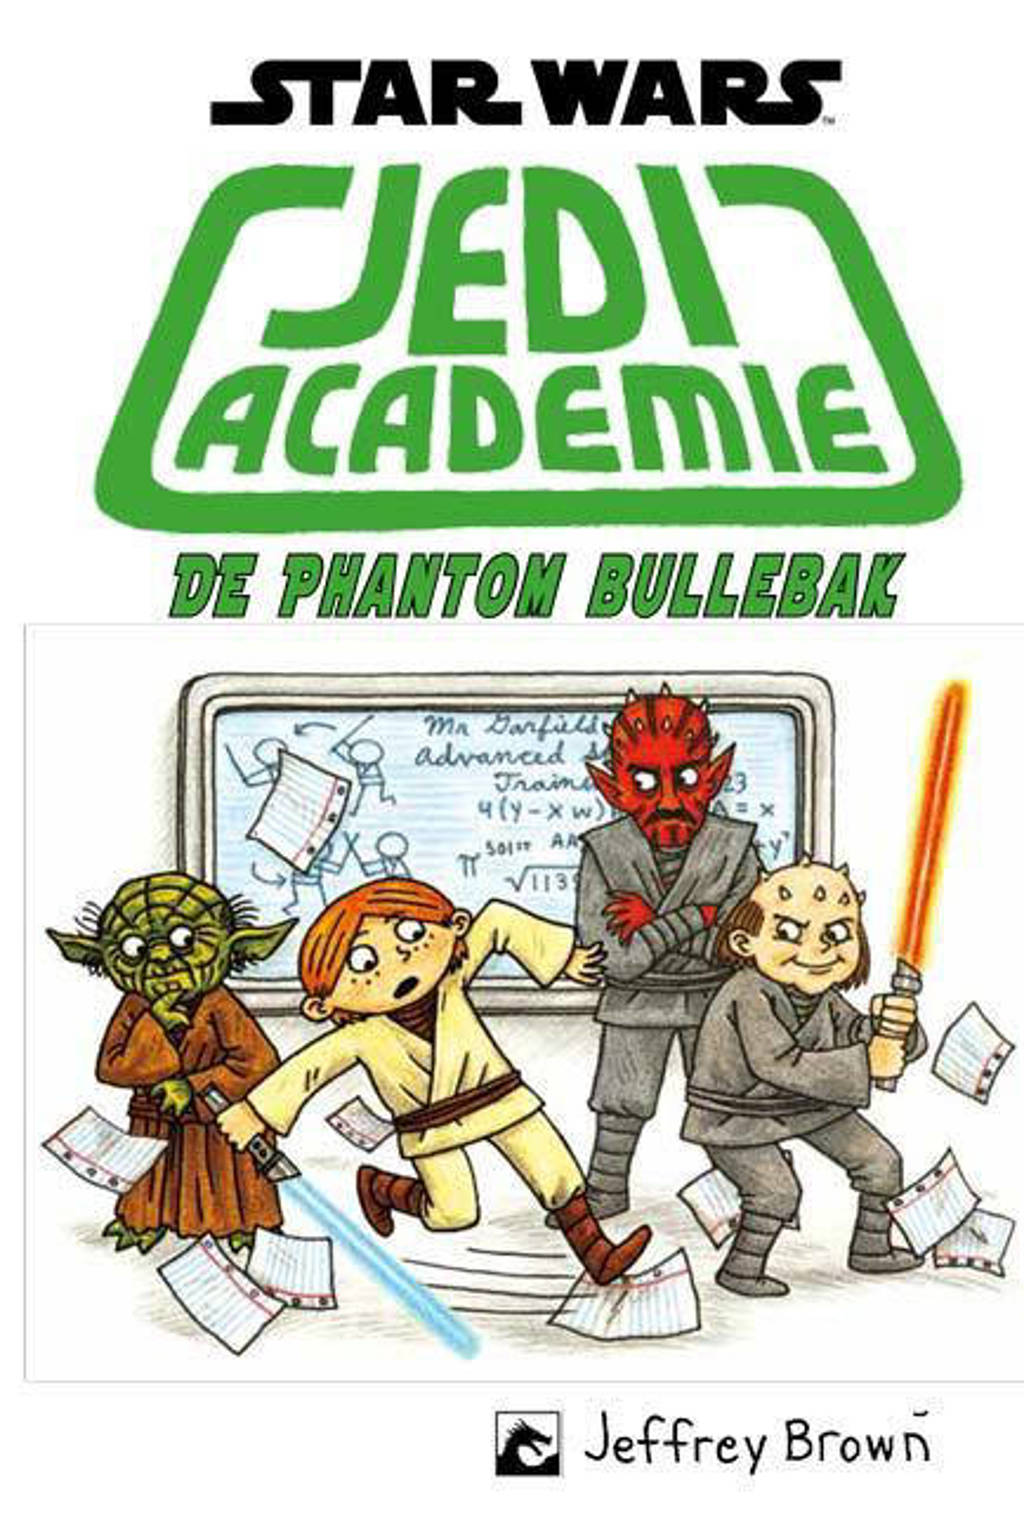 Star Wars: Jedi Academie 3 de phantom bullebak - Jeffrey Brown